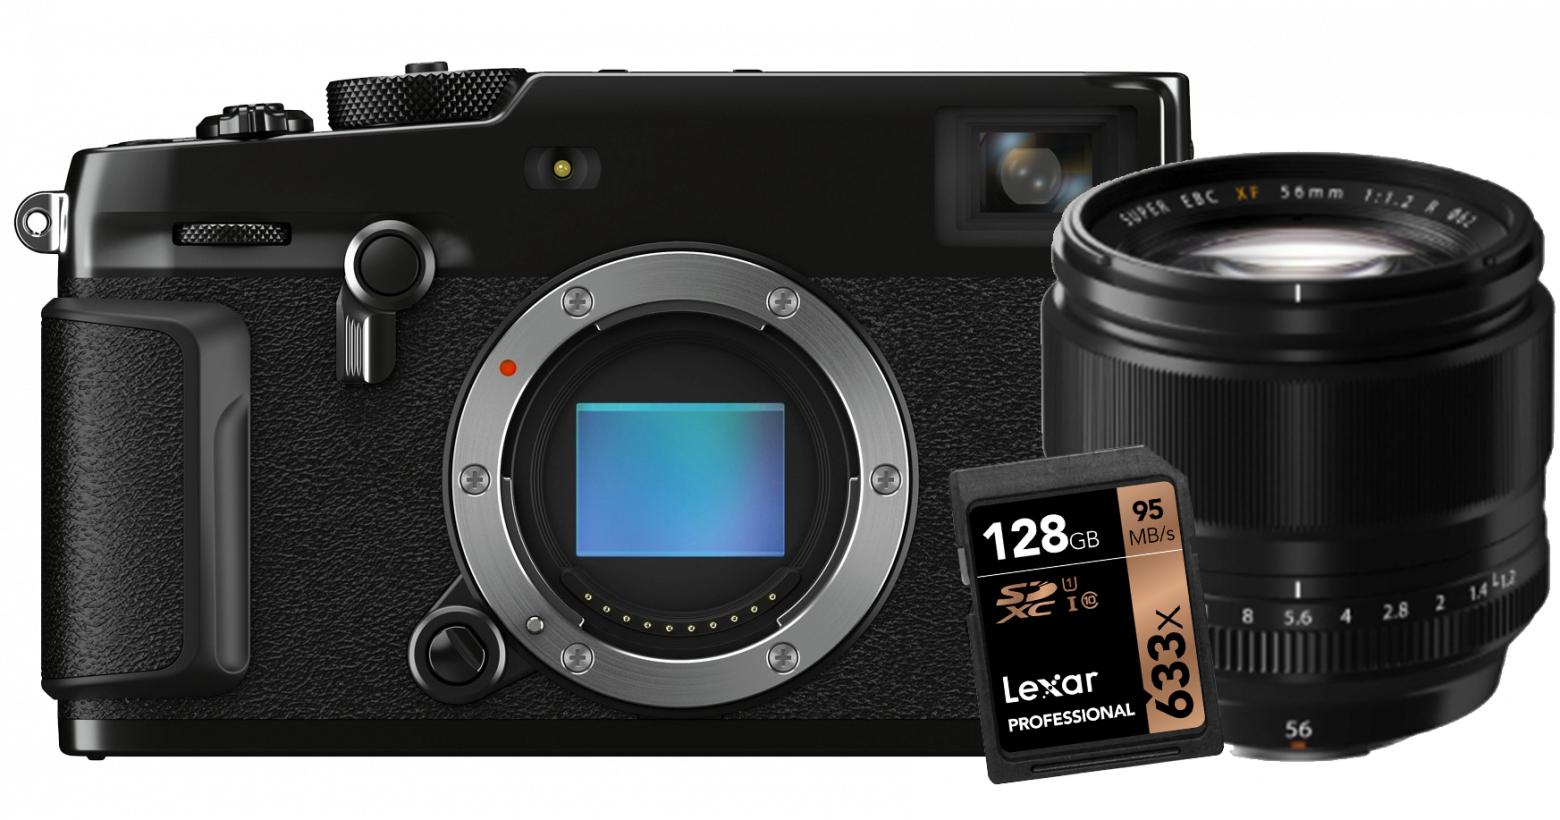 Fujifilm X-Pro3 inkl. Fujinon XF56F1,2 & SD Karte oder X-T4 inkl. XC35F2, SD Karte & Tasche für 1895,95€   Cameraworld UK